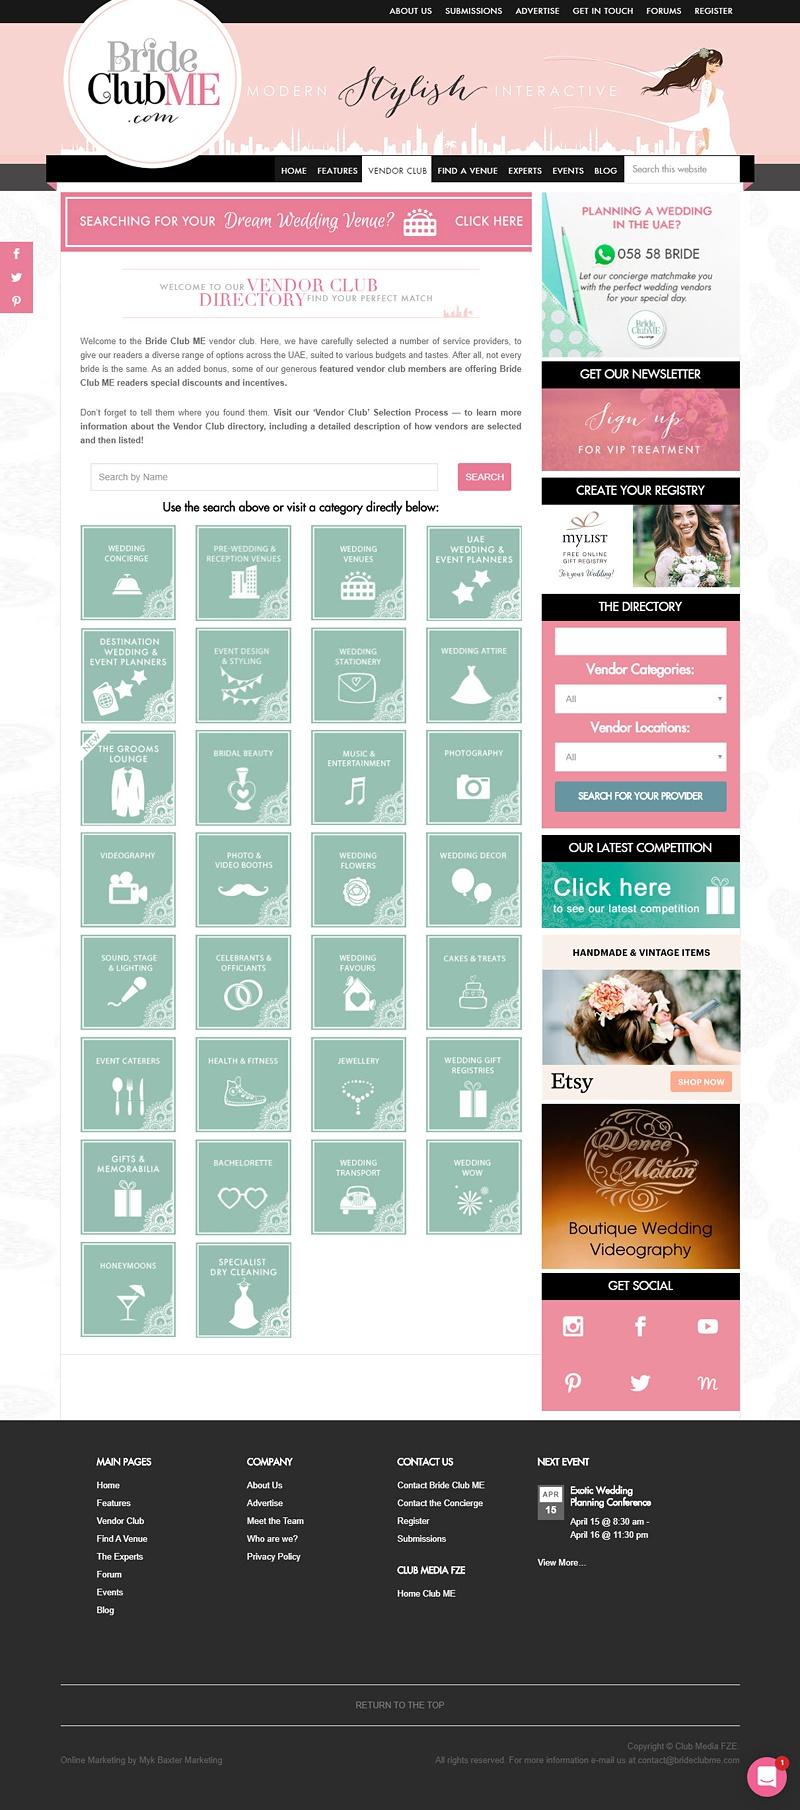 BrideClubMe Directory